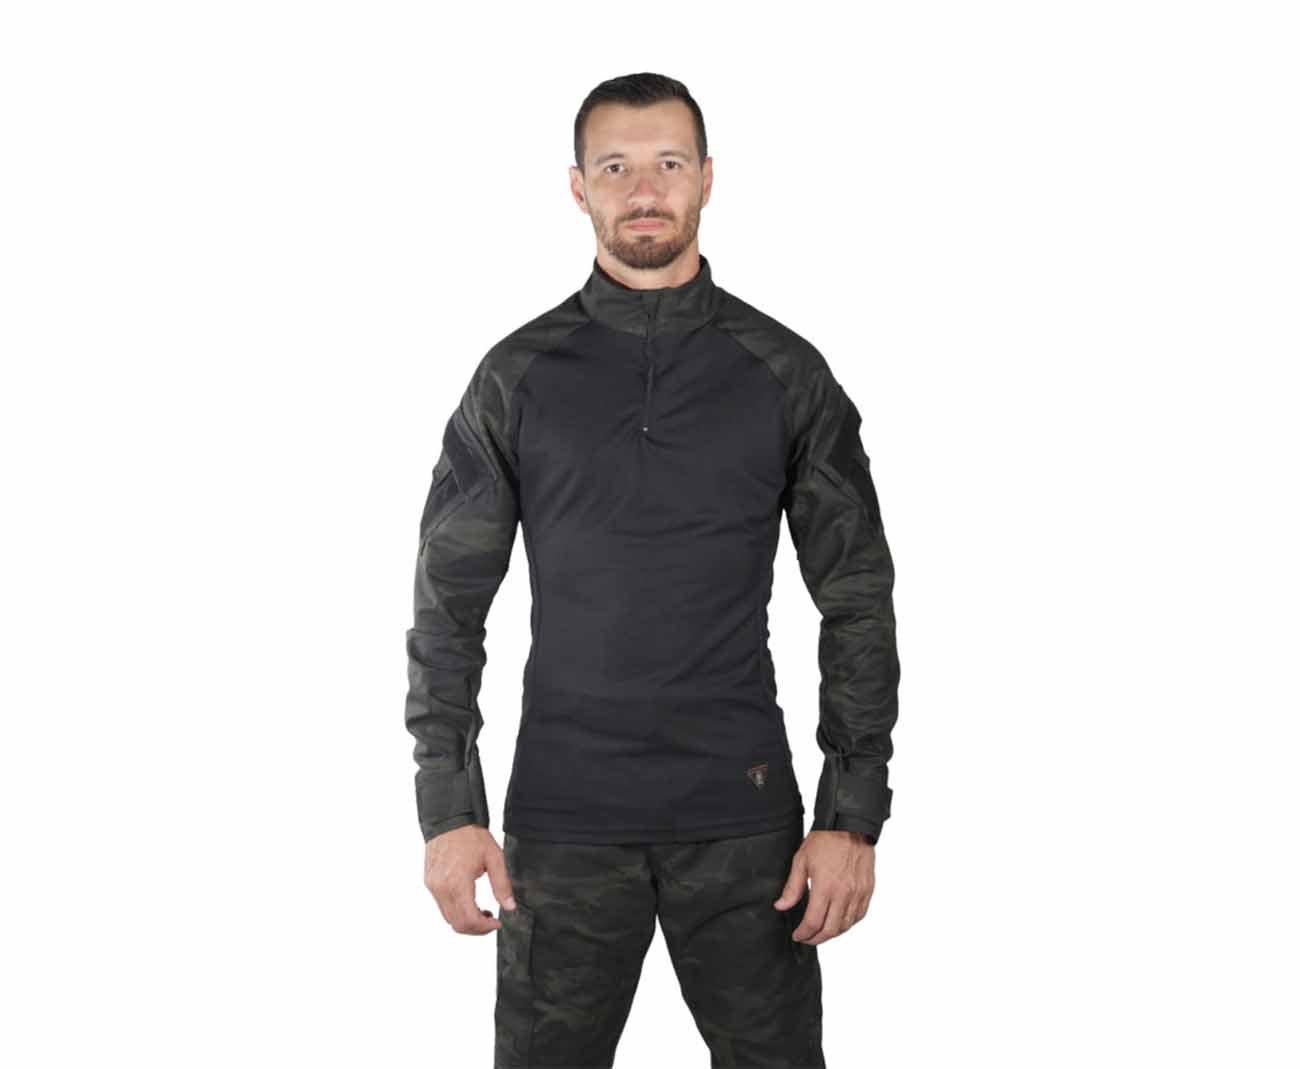 Camisa Combat Shirt Treme Terra Multicam Black - Treme Terra